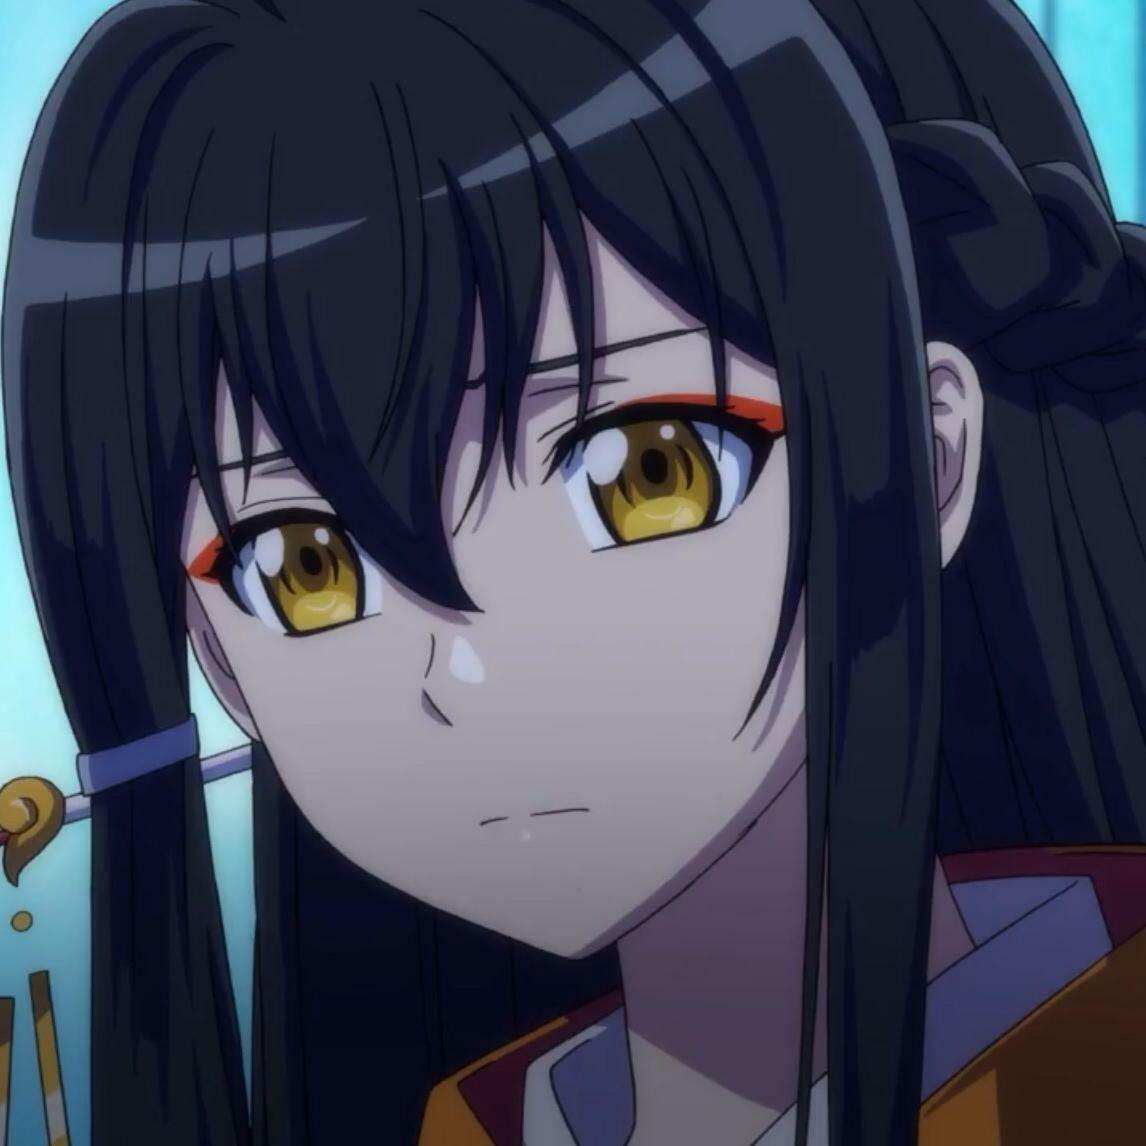 Uwu Tớ Cần 1 Follow Của Cậu 33 Menina Anime Personagens De